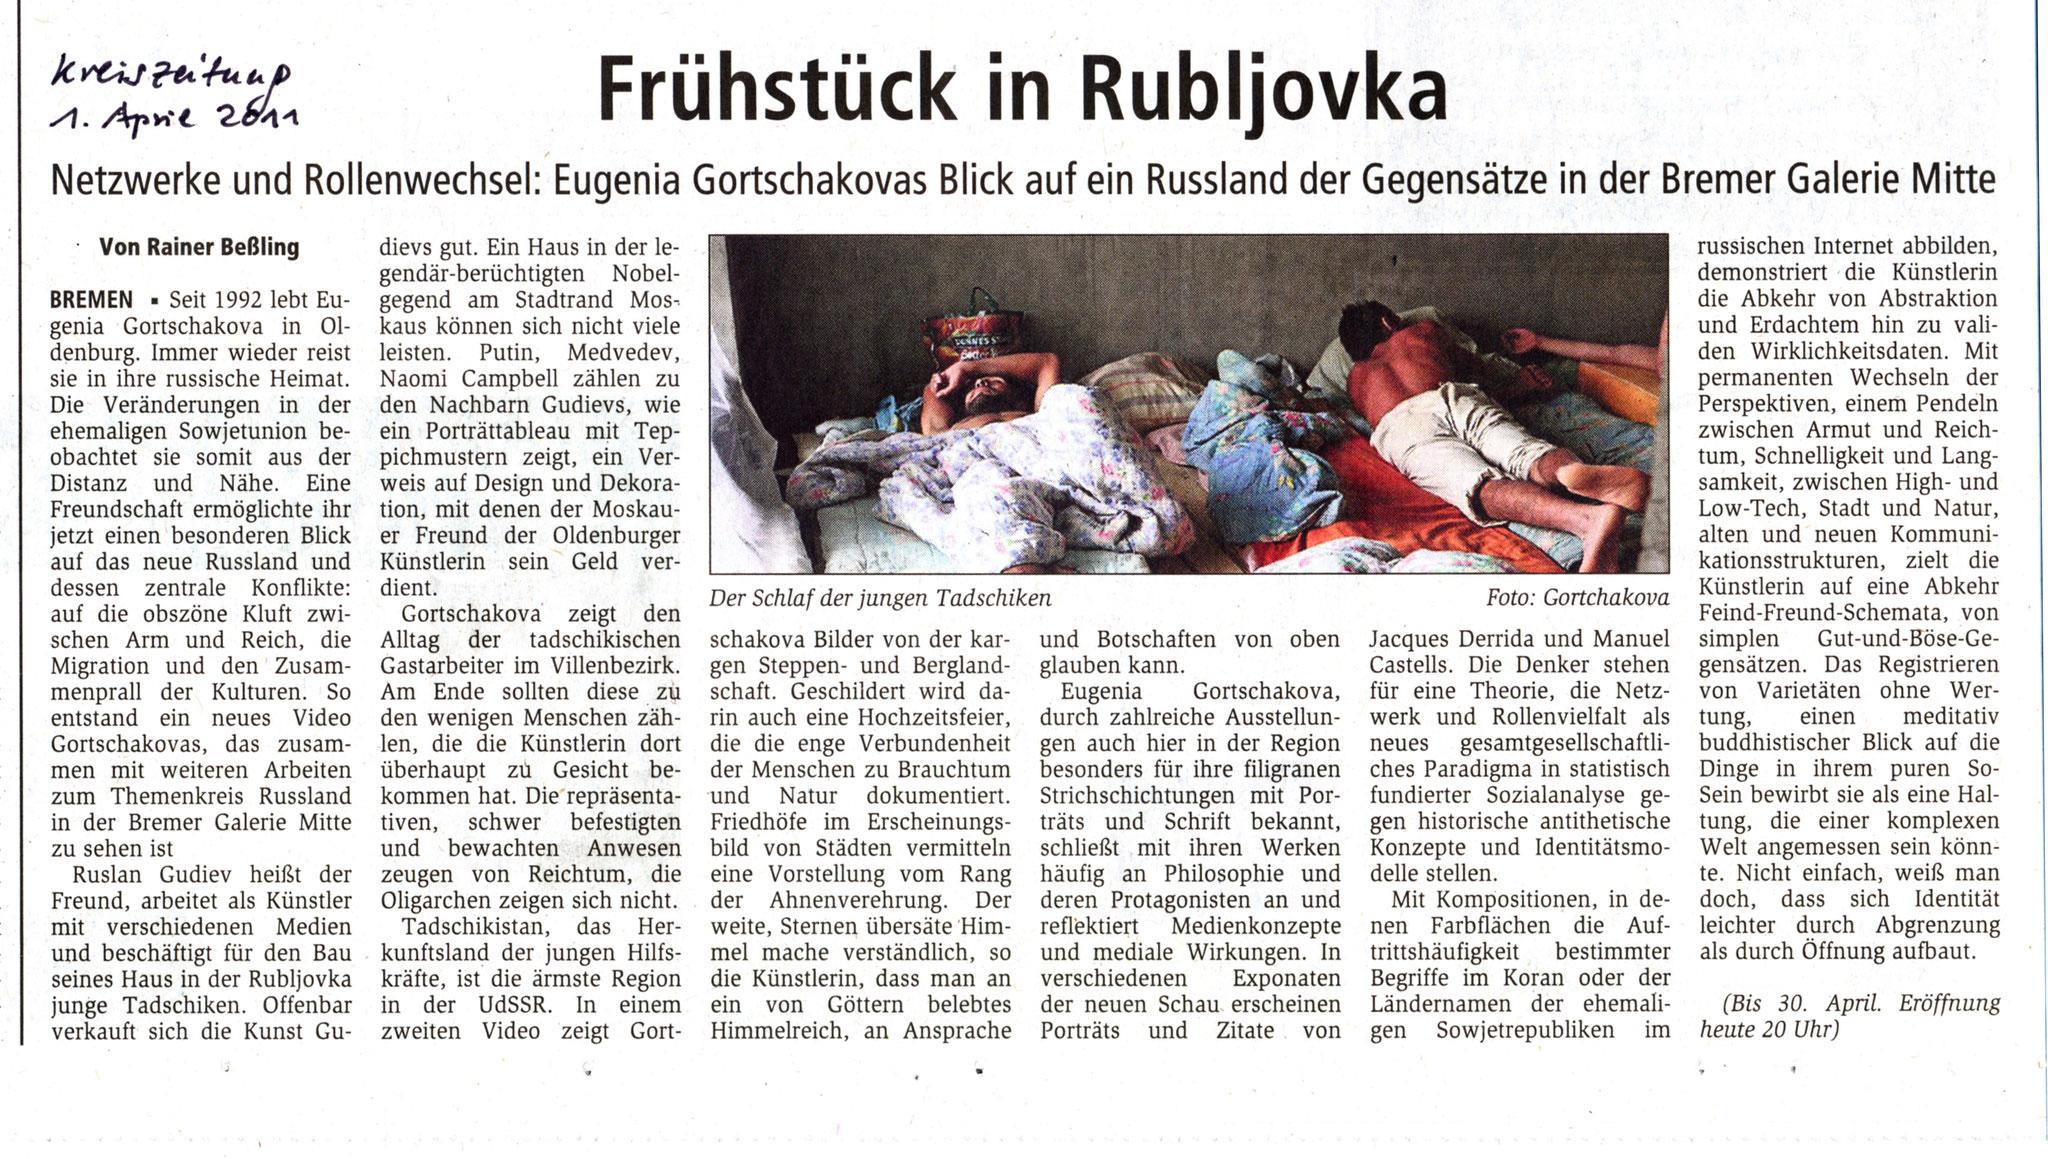 Kreiszeitung, Rainer Beßling, 01.04.2011